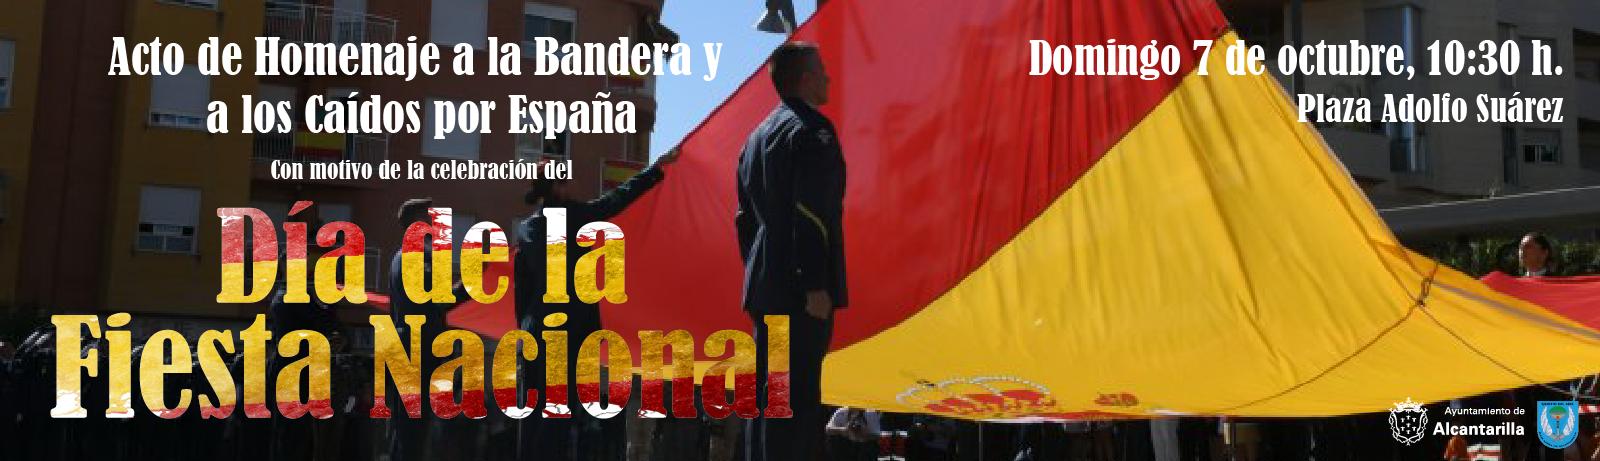 bannerweb_dia Hispanidad-01